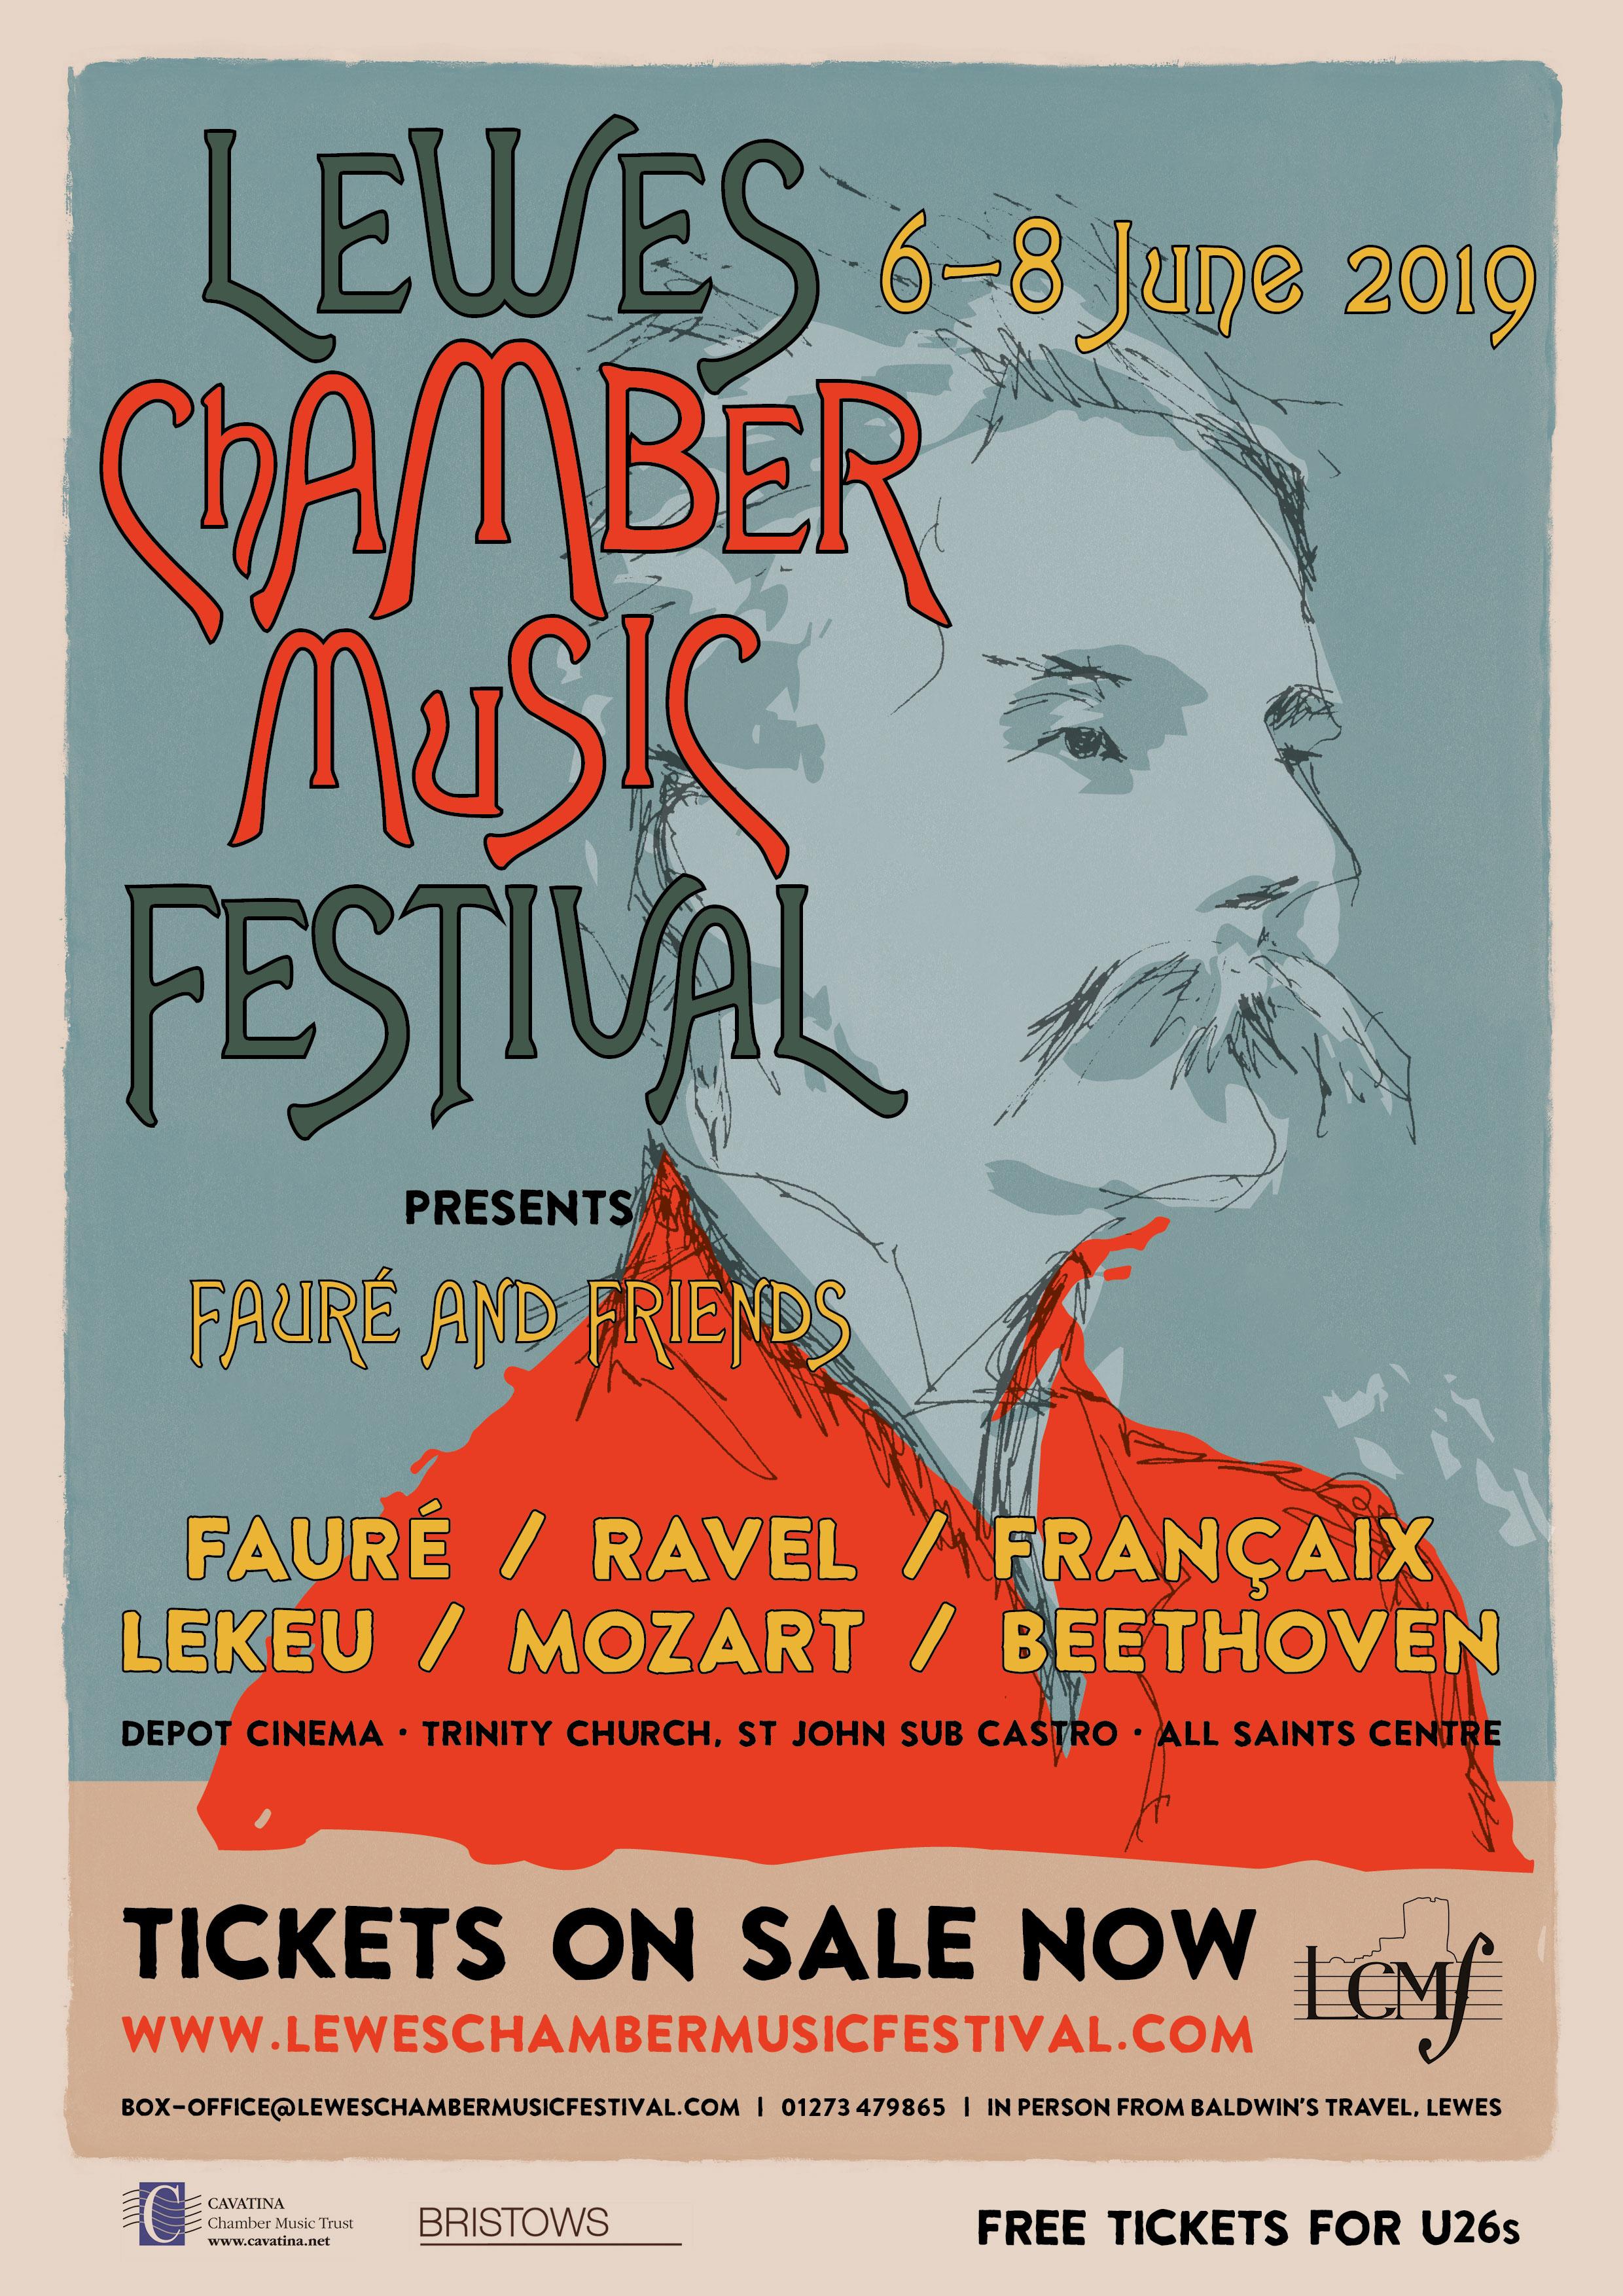 Lewes2019_Poster1_WEB.jpg